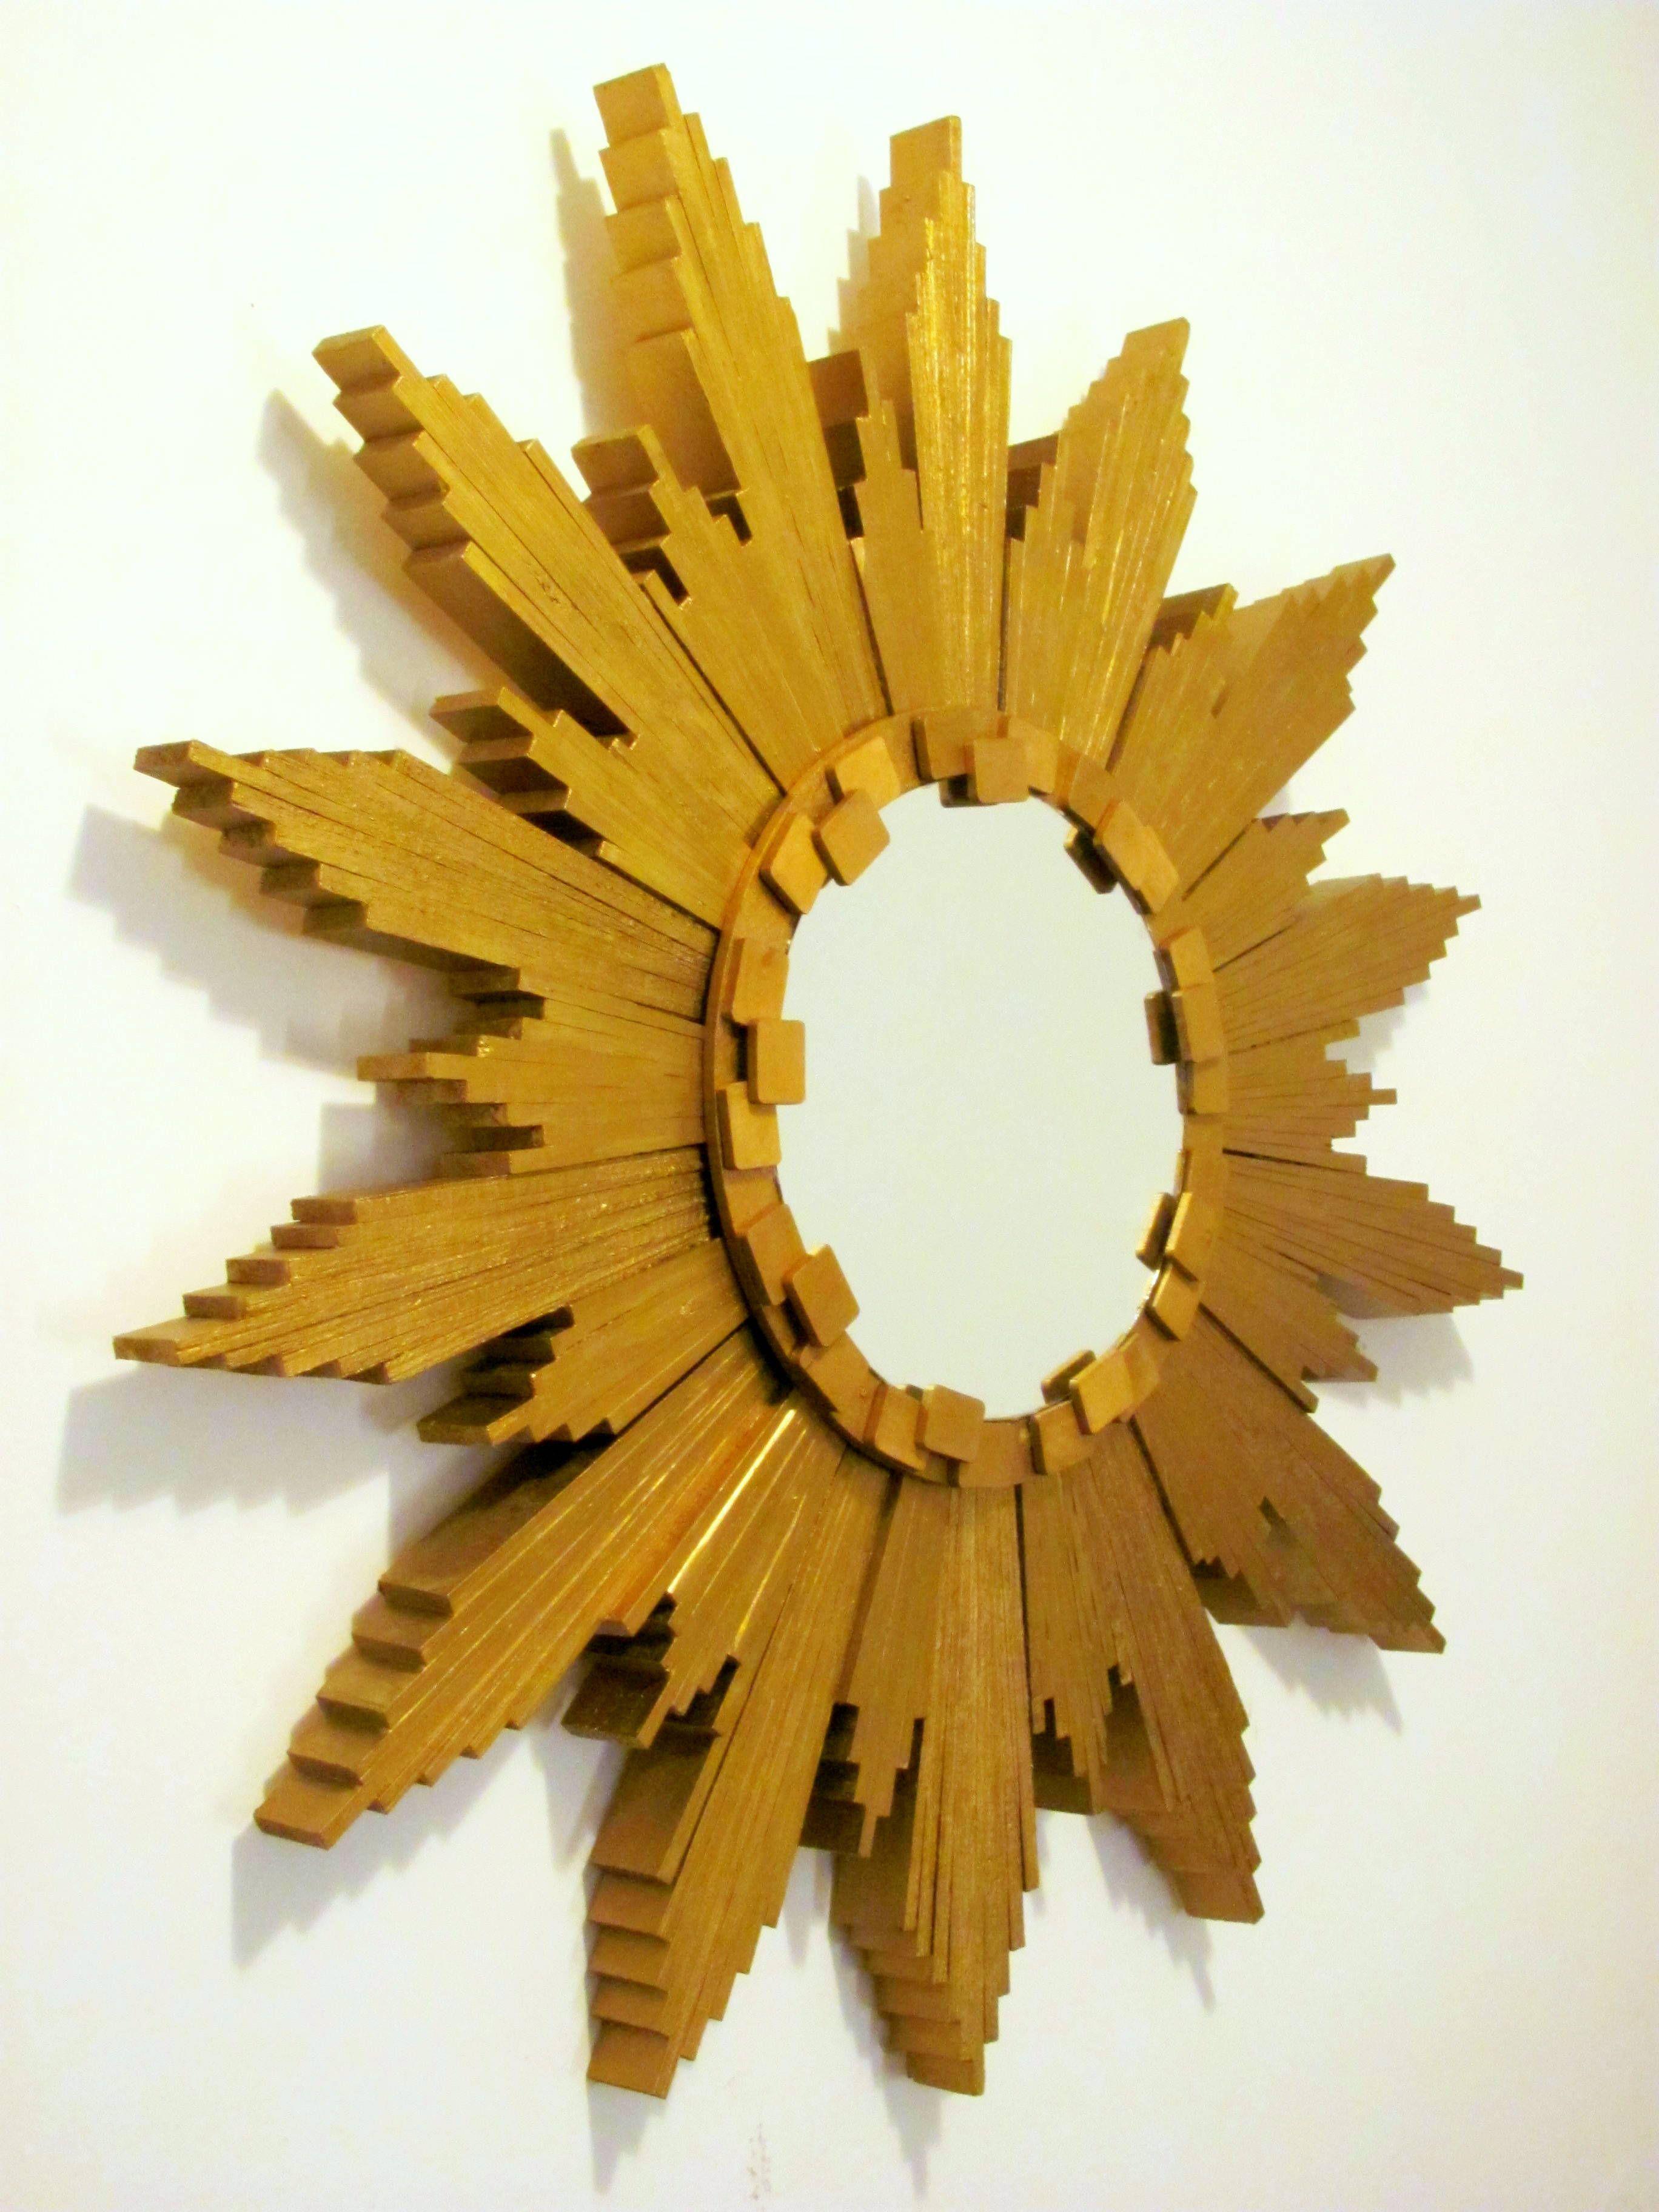 Sunburst Mirror (with Wood Shims) - DIY | Diy Furniture | Pinterest ...